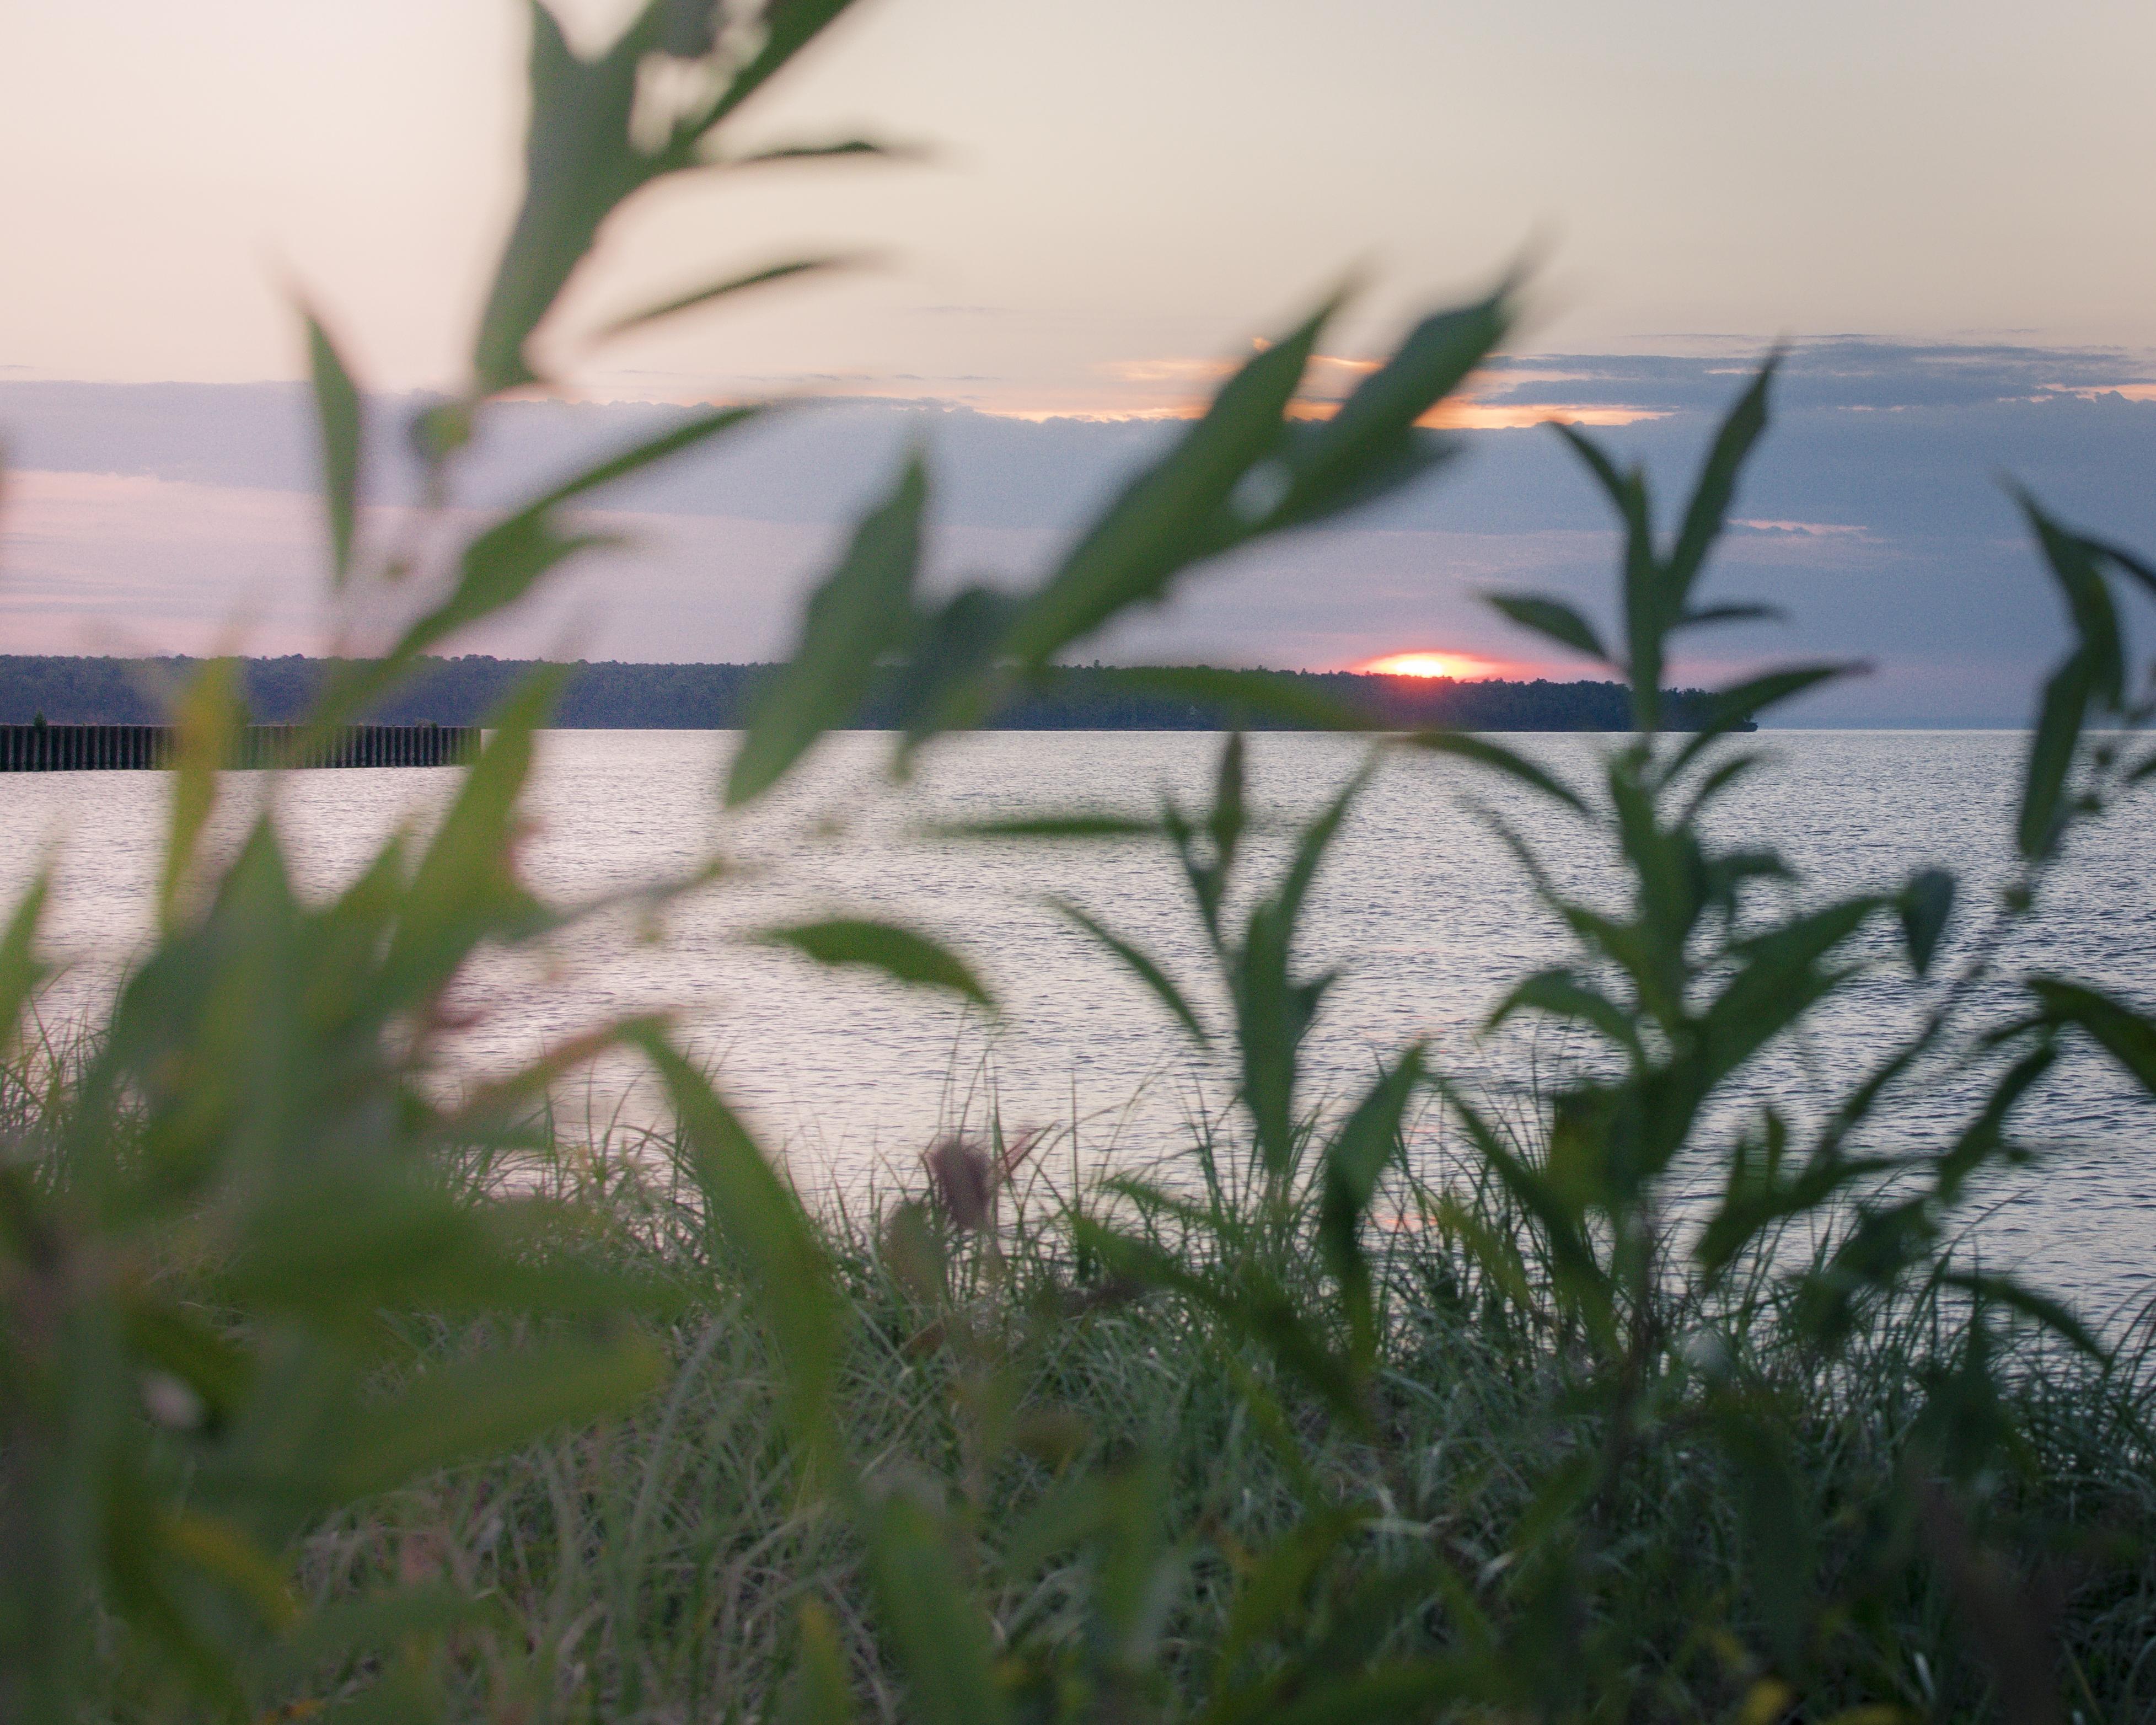 gfancy_corny_sunset_throughgrass